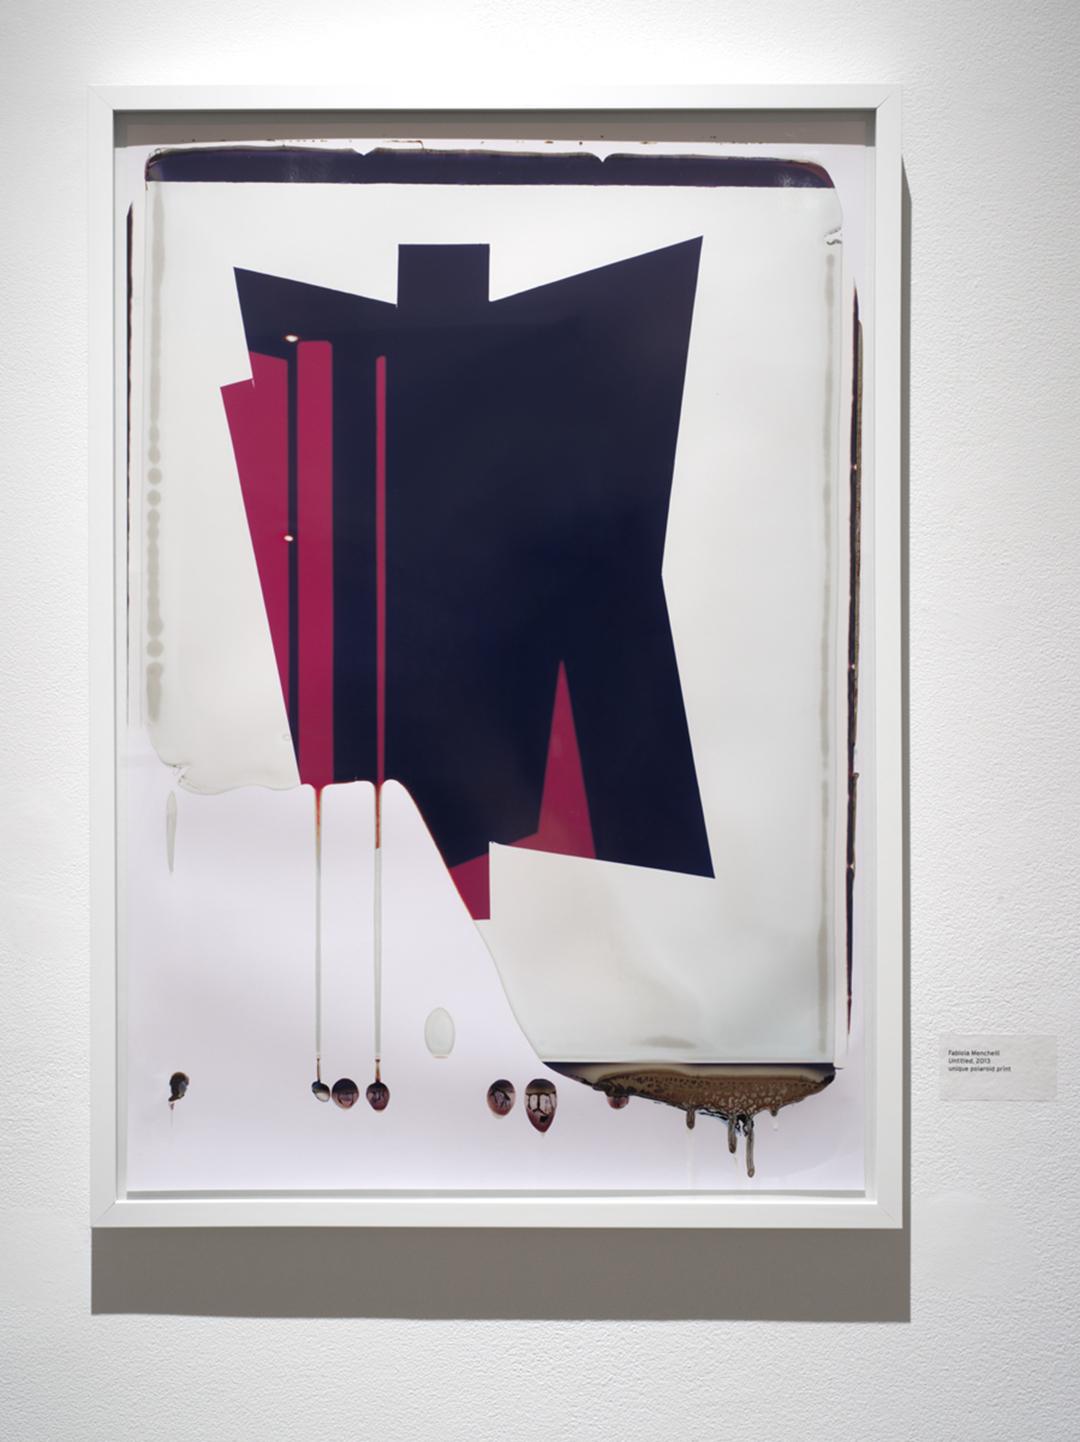 "Fabiola Menchelli, Dripping Red and black polaroid, 2013, 20 x 24"" Polaroid print"